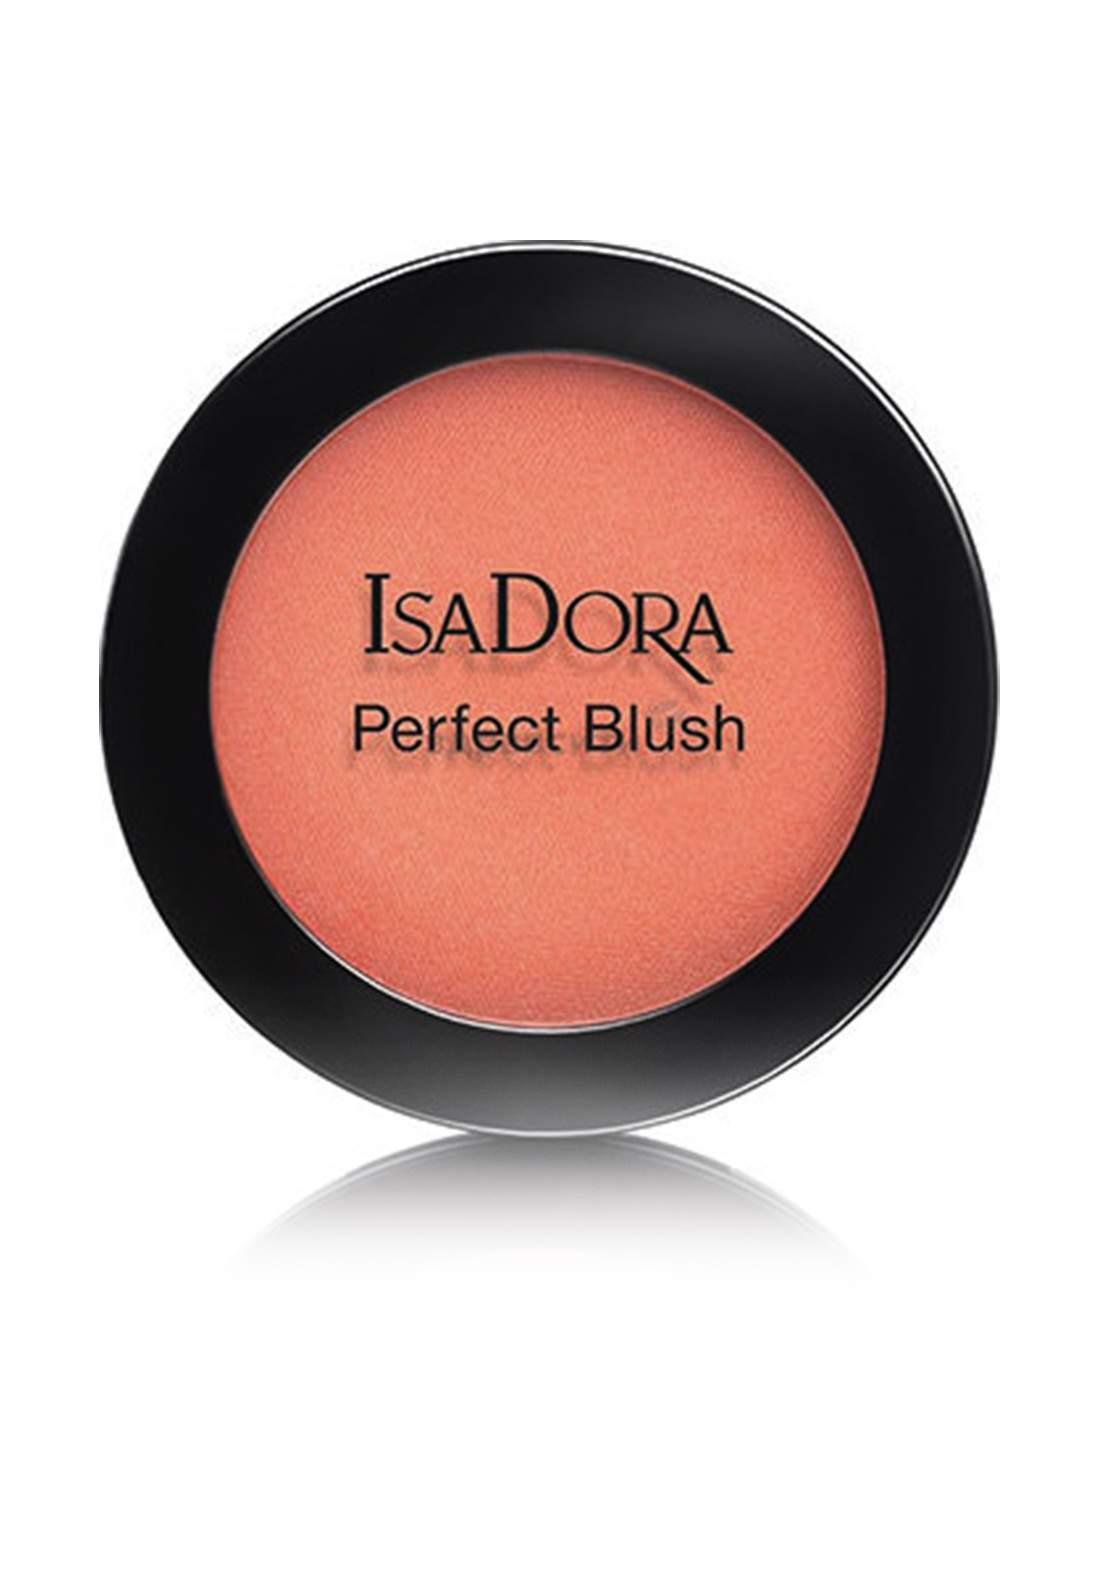 IsaDora 314274 Perfect Blush - Poppy Peach No.50 احمر خدود